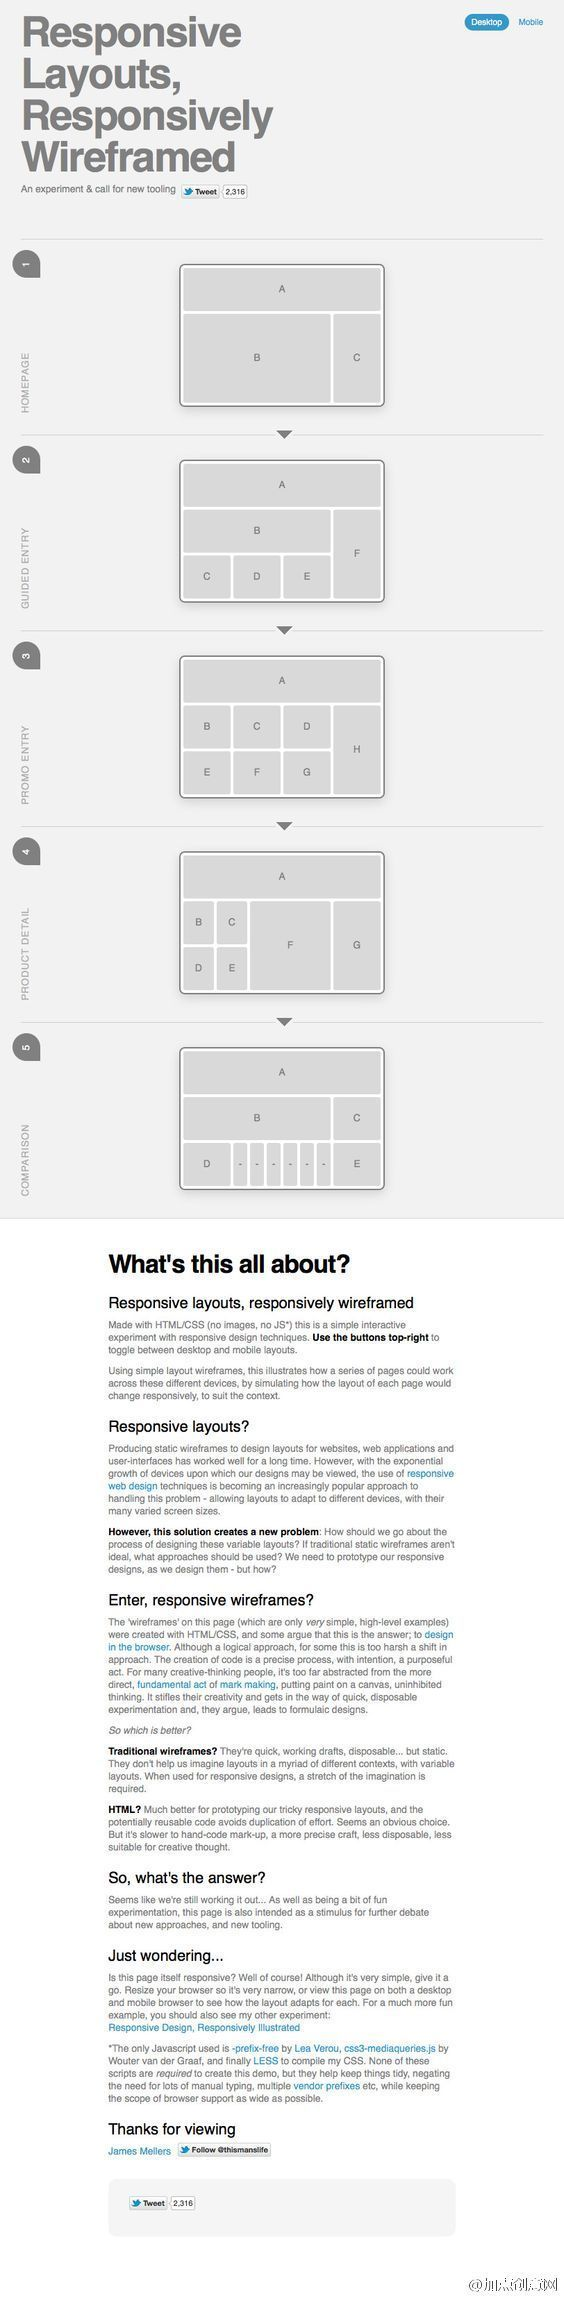 63 best web design images on pinterest web design inspiration the ux blog podcast fandeluxe Gallery